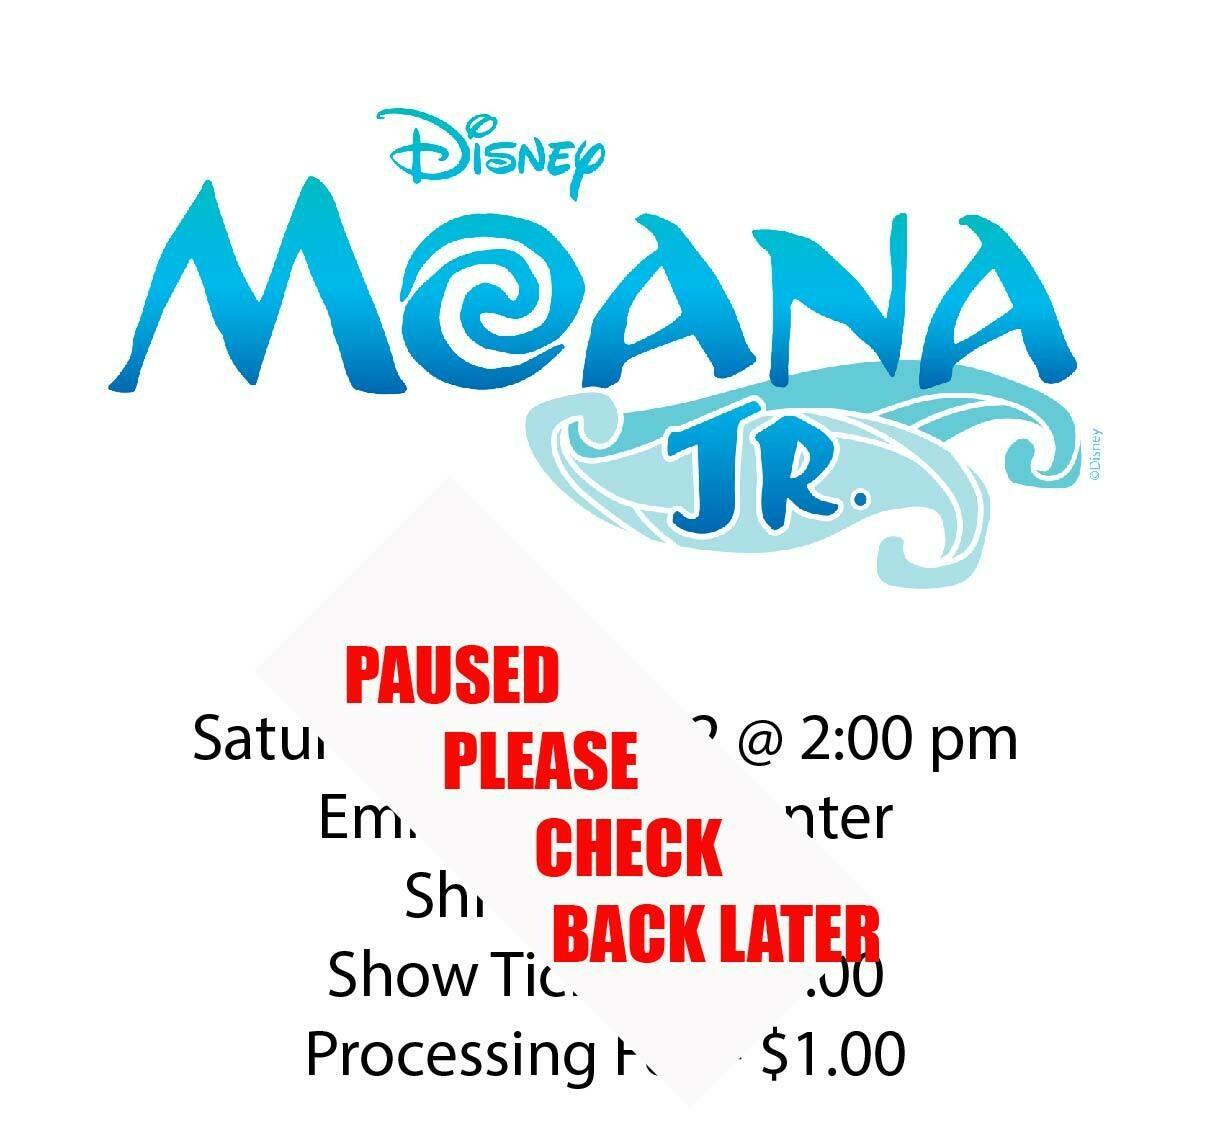 Disney's Moana JR., Saturday January 2nd @ 2:00 pm